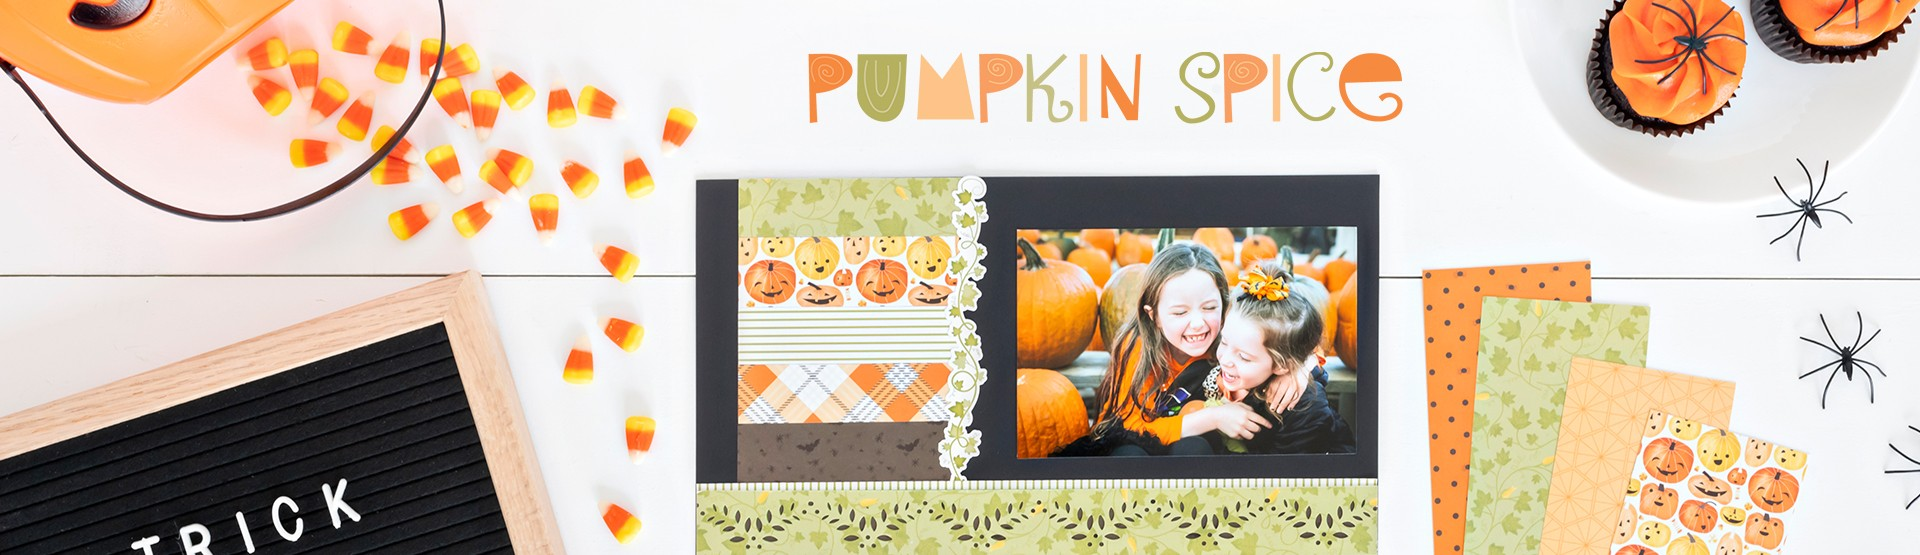 Autumn & Halloween: Pumpkin Spice